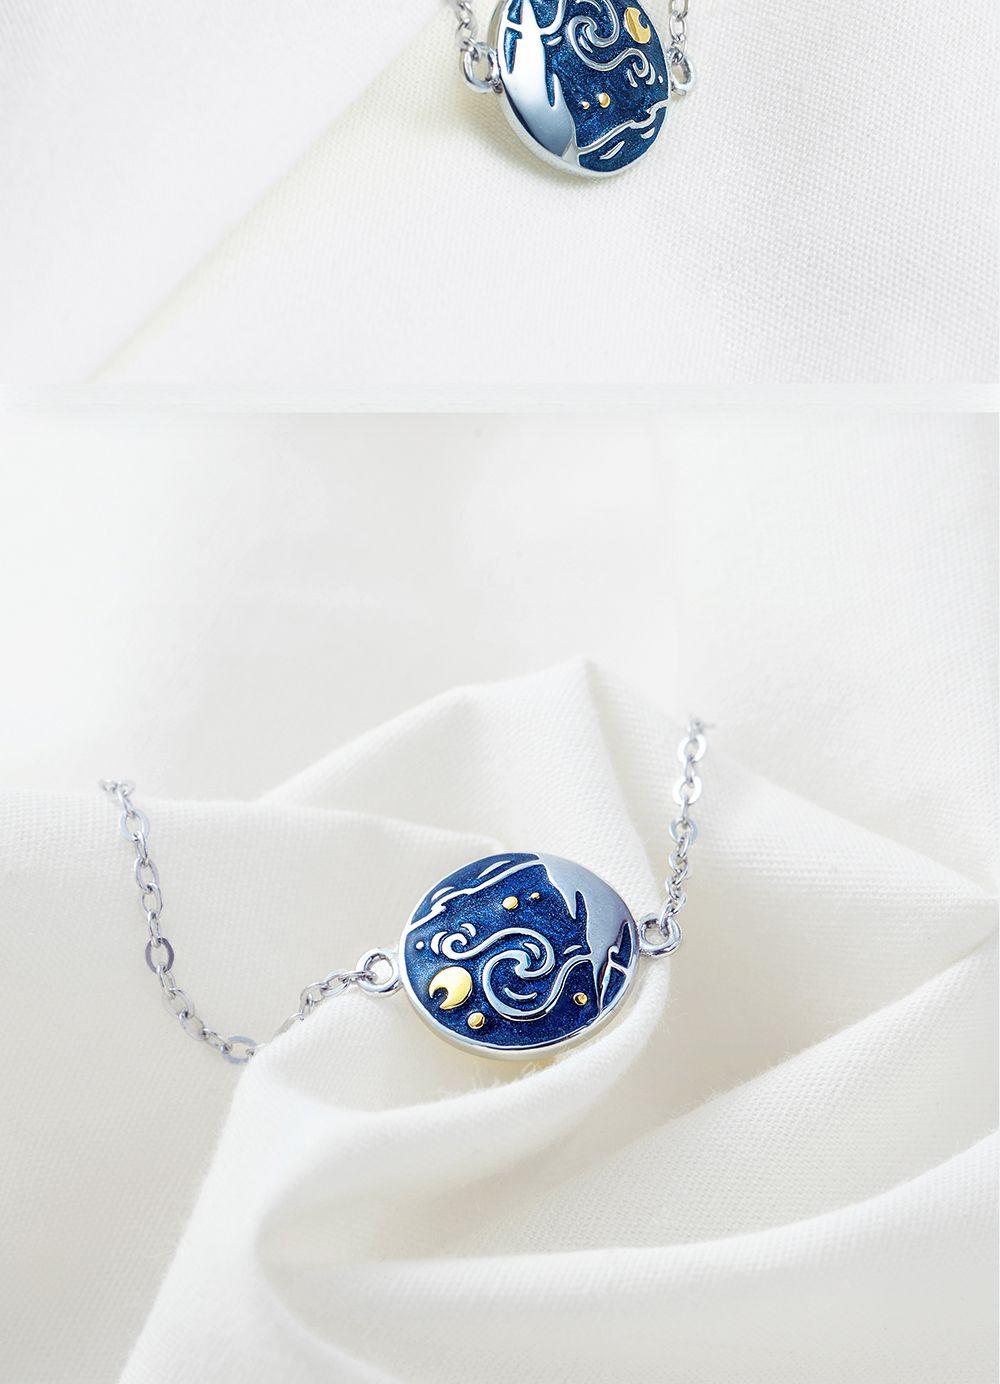 Thaya Van Gogh Enamel Cloisonne Plated Bracelet Van Gogh painting miniature